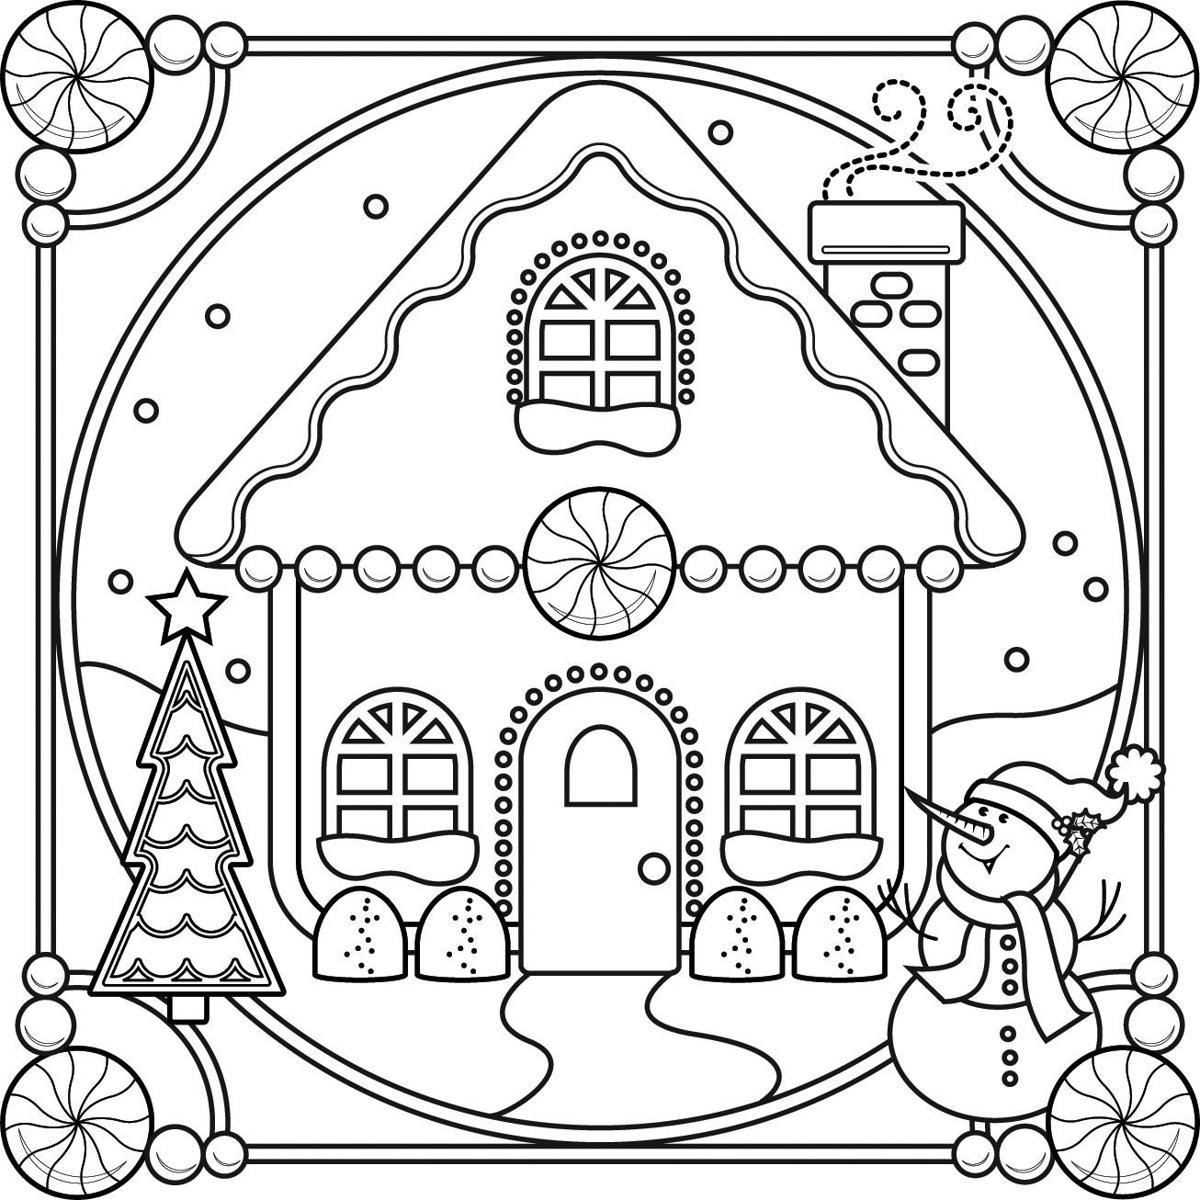 TCR Christmas Coloring Contest!   News   rapidcityjournal.com